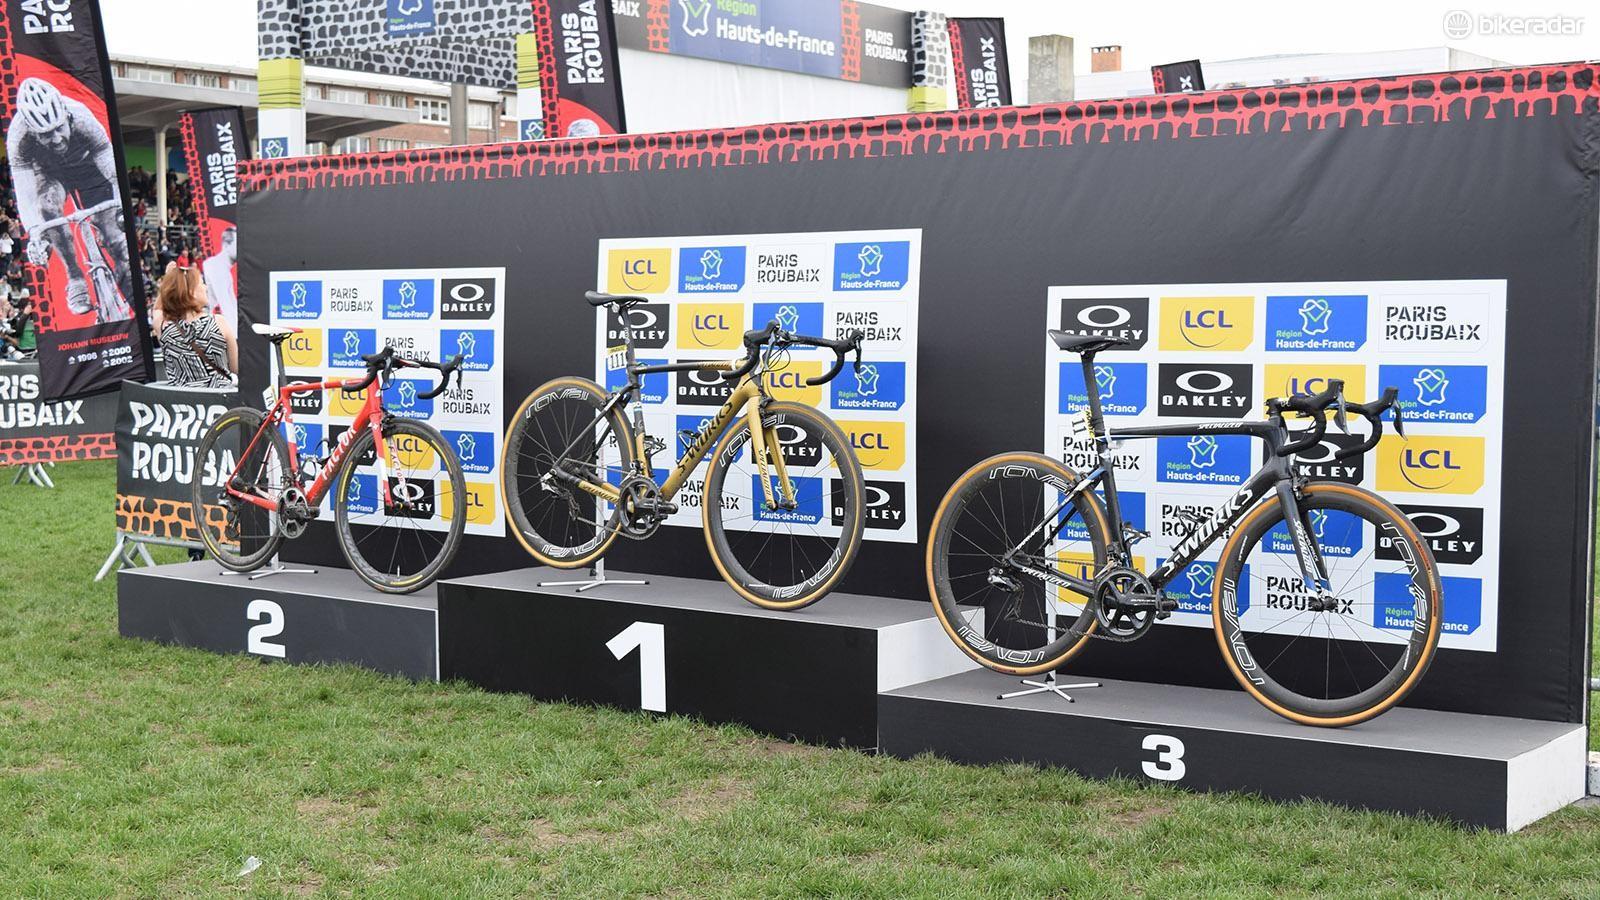 The Paris-Roubaix 2018 podium bikes: Sagan's S-Works Roubaix, Dillier's Factor O2 and Terpstra's S-Works Tarmac